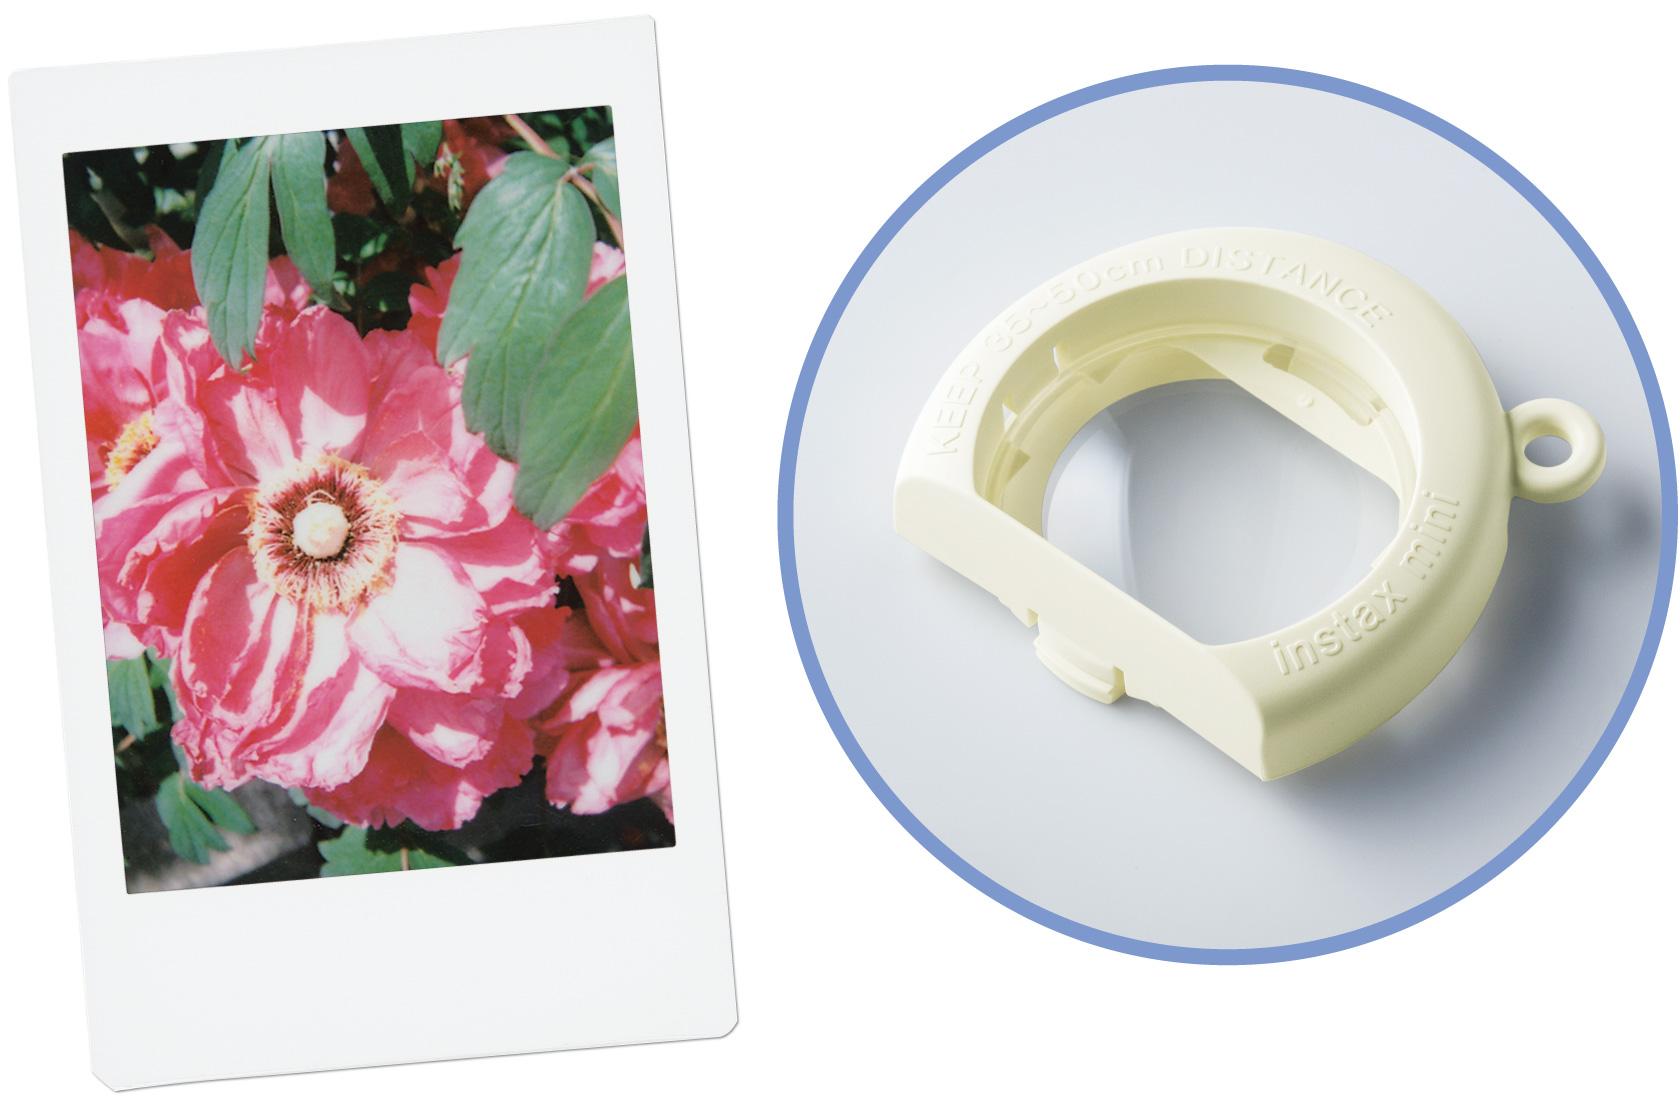 [photo] 인스탁스 미니9 리미티드 에디션 필름카메라 전용 접사 렌즈와 샘플 사진